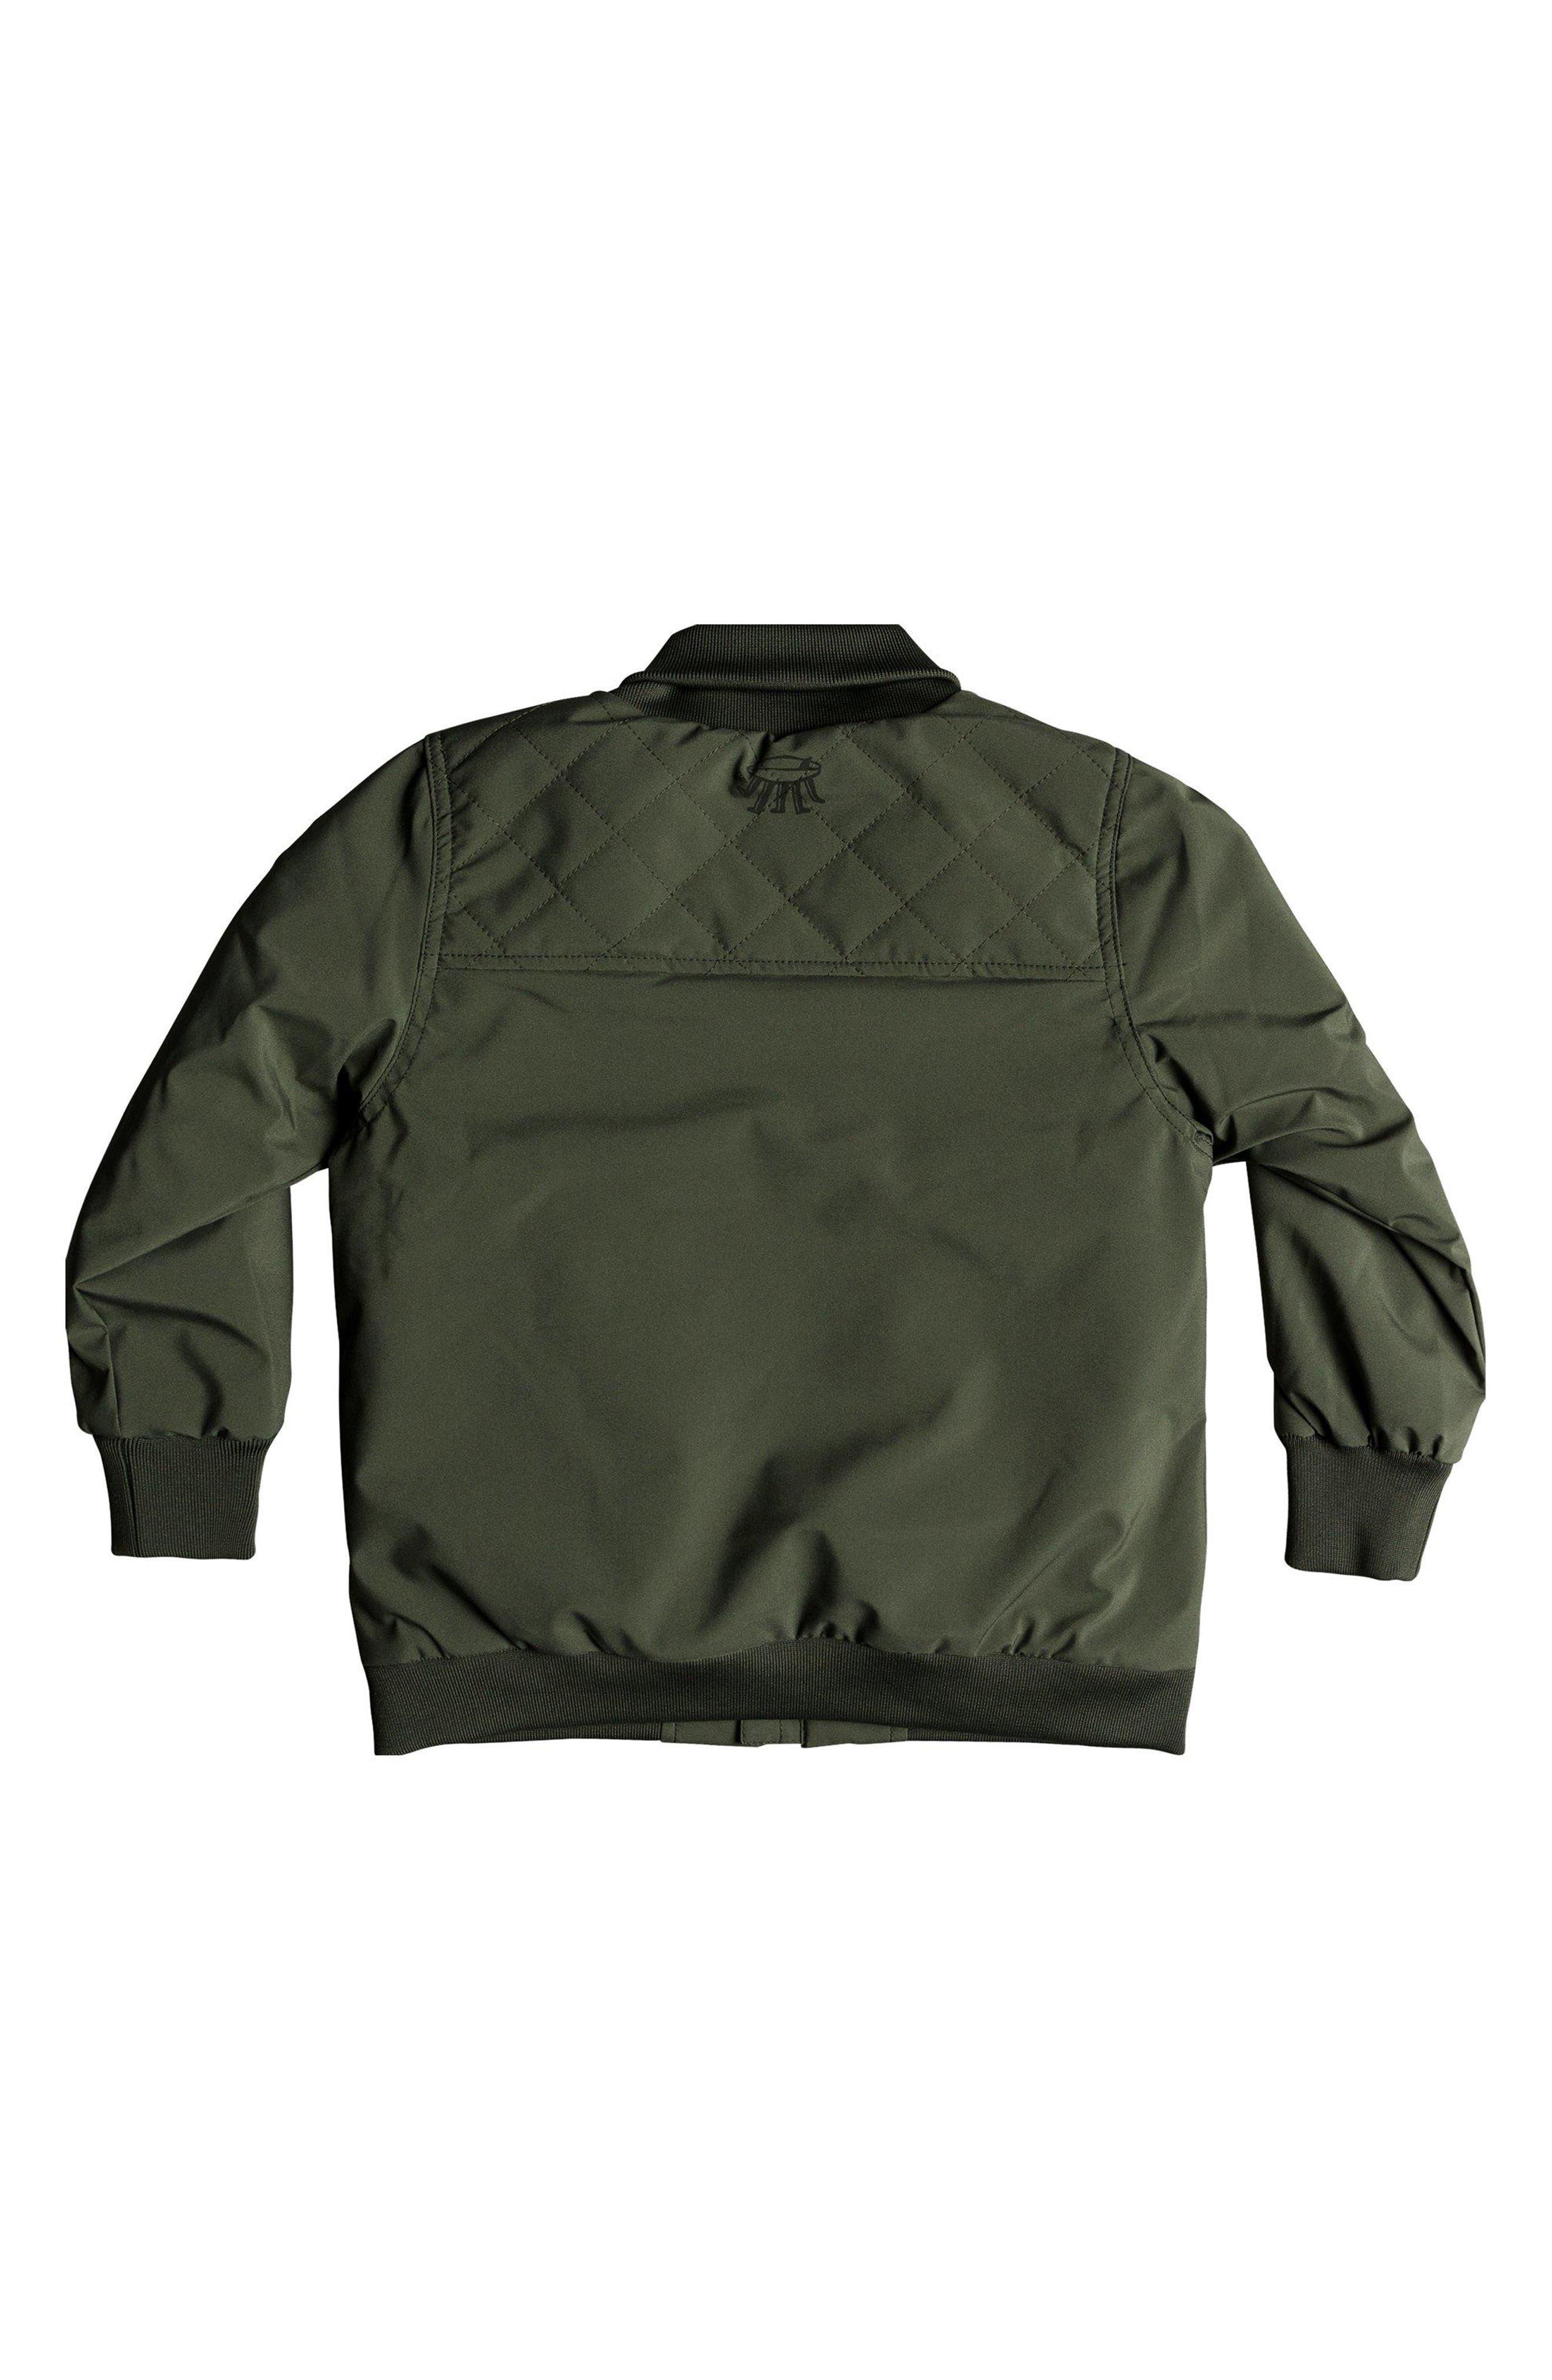 Mankai Sun Bomber Jacket,                             Alternate thumbnail 2, color,                             THYME